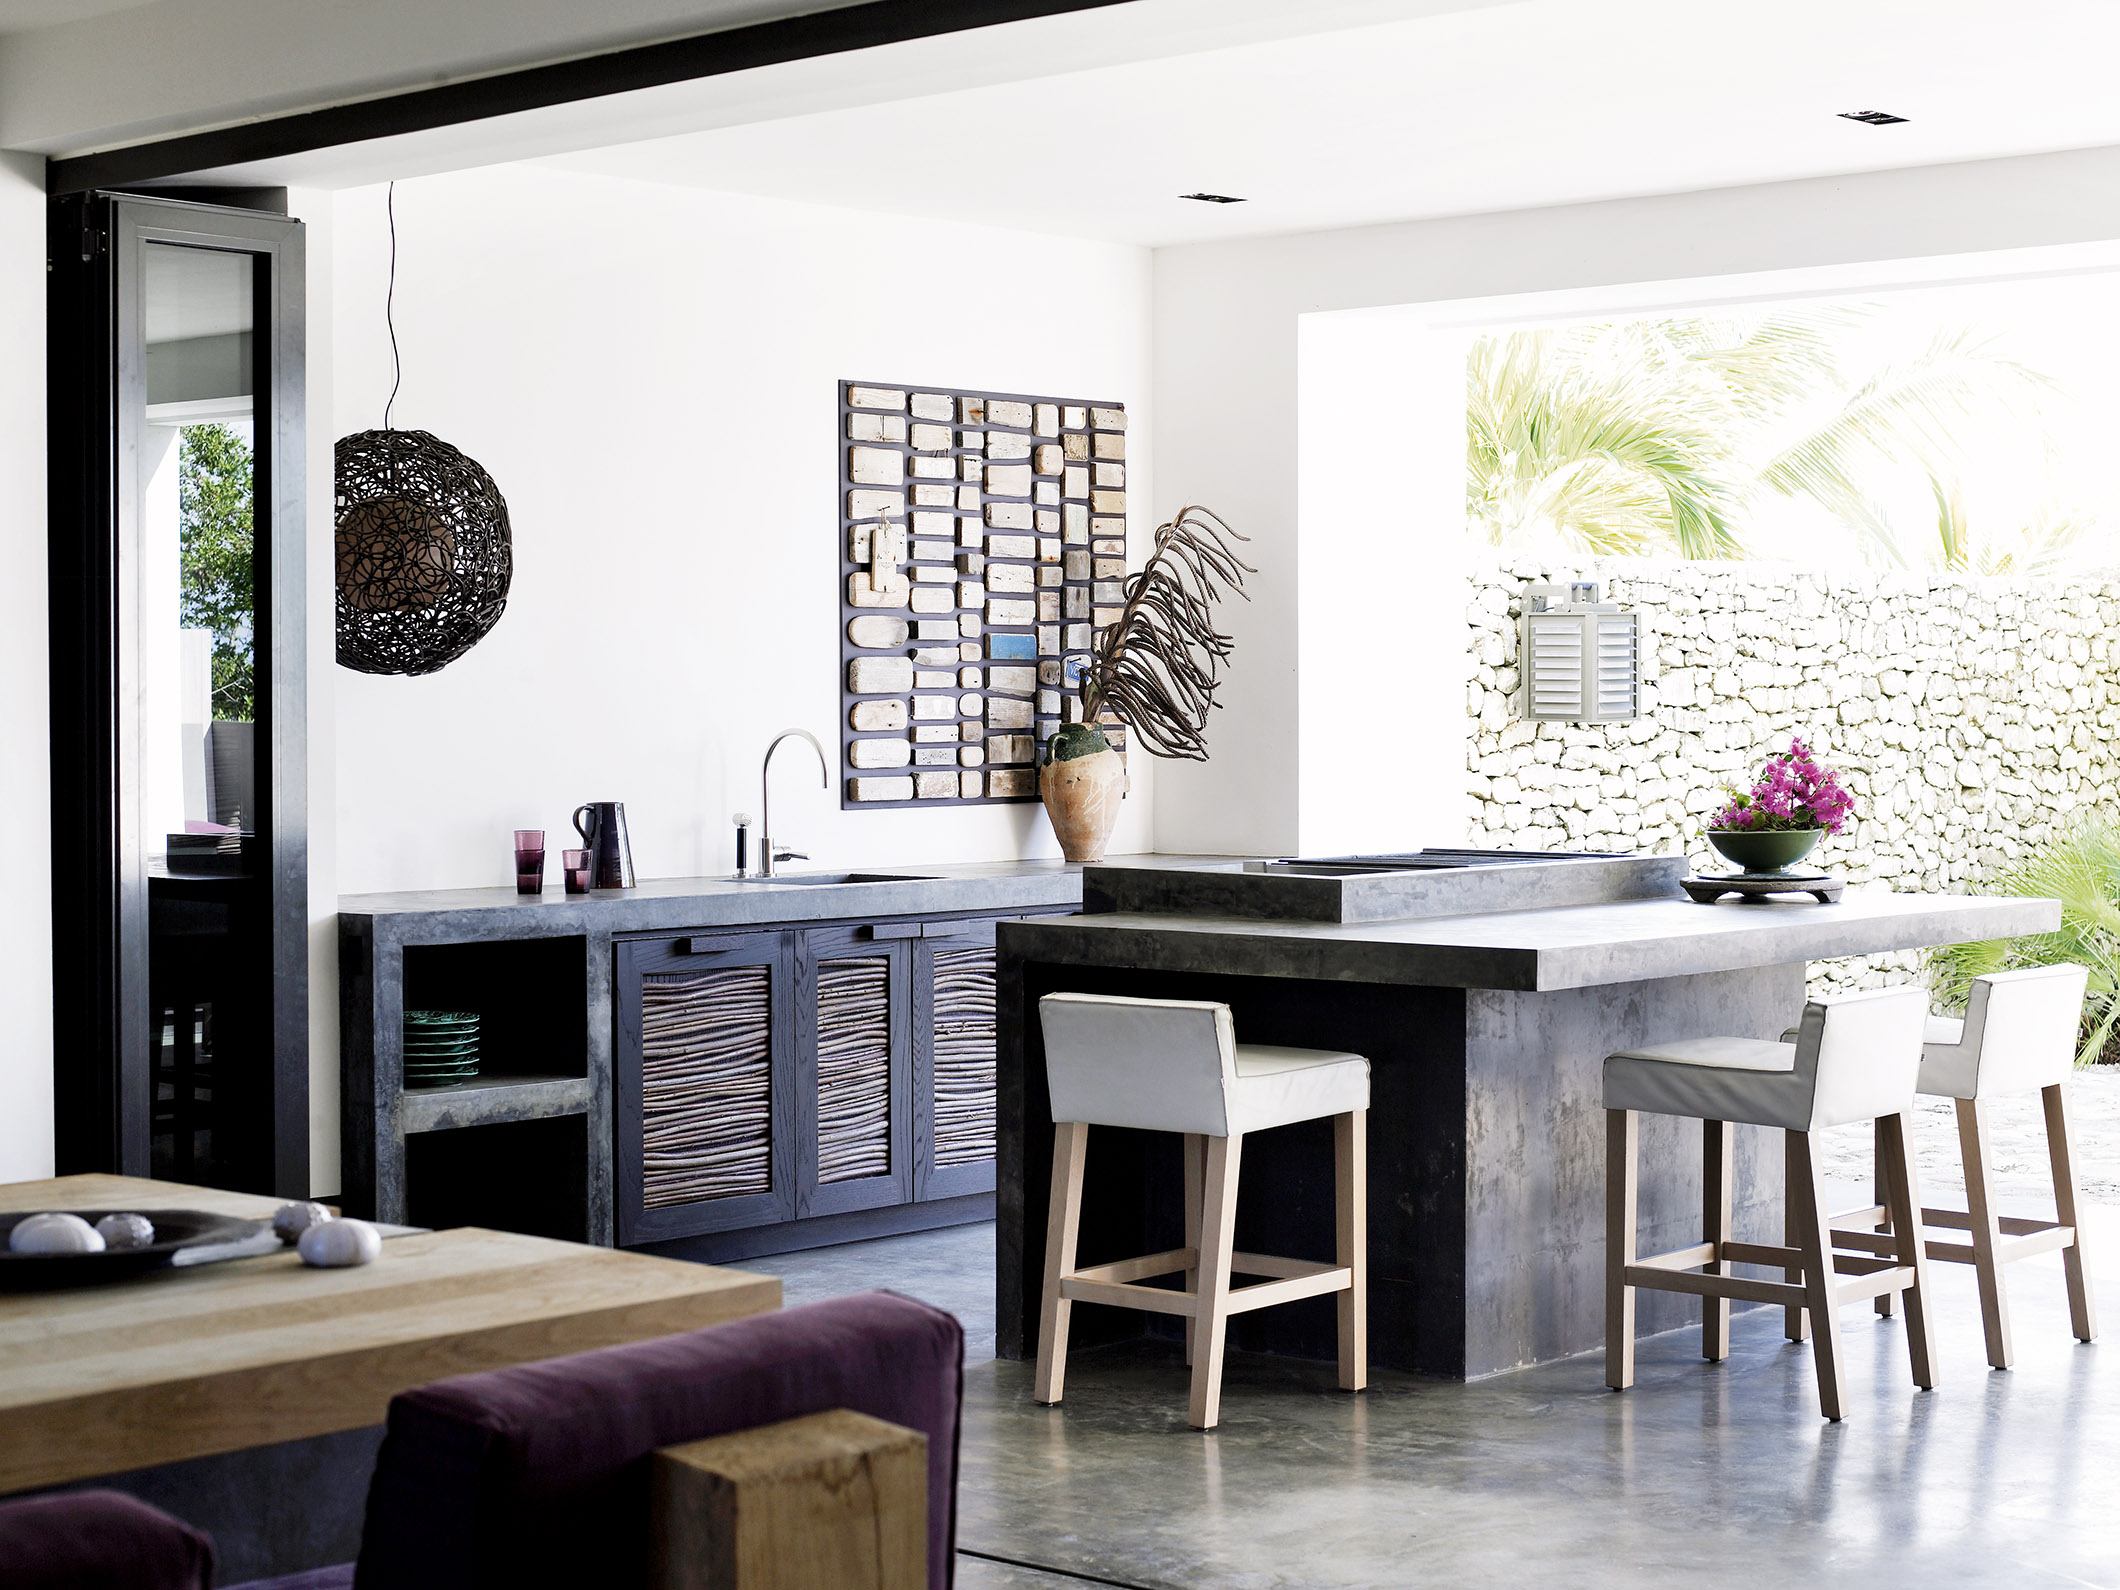 Caribbean beach residence with SAAR kitchen stool